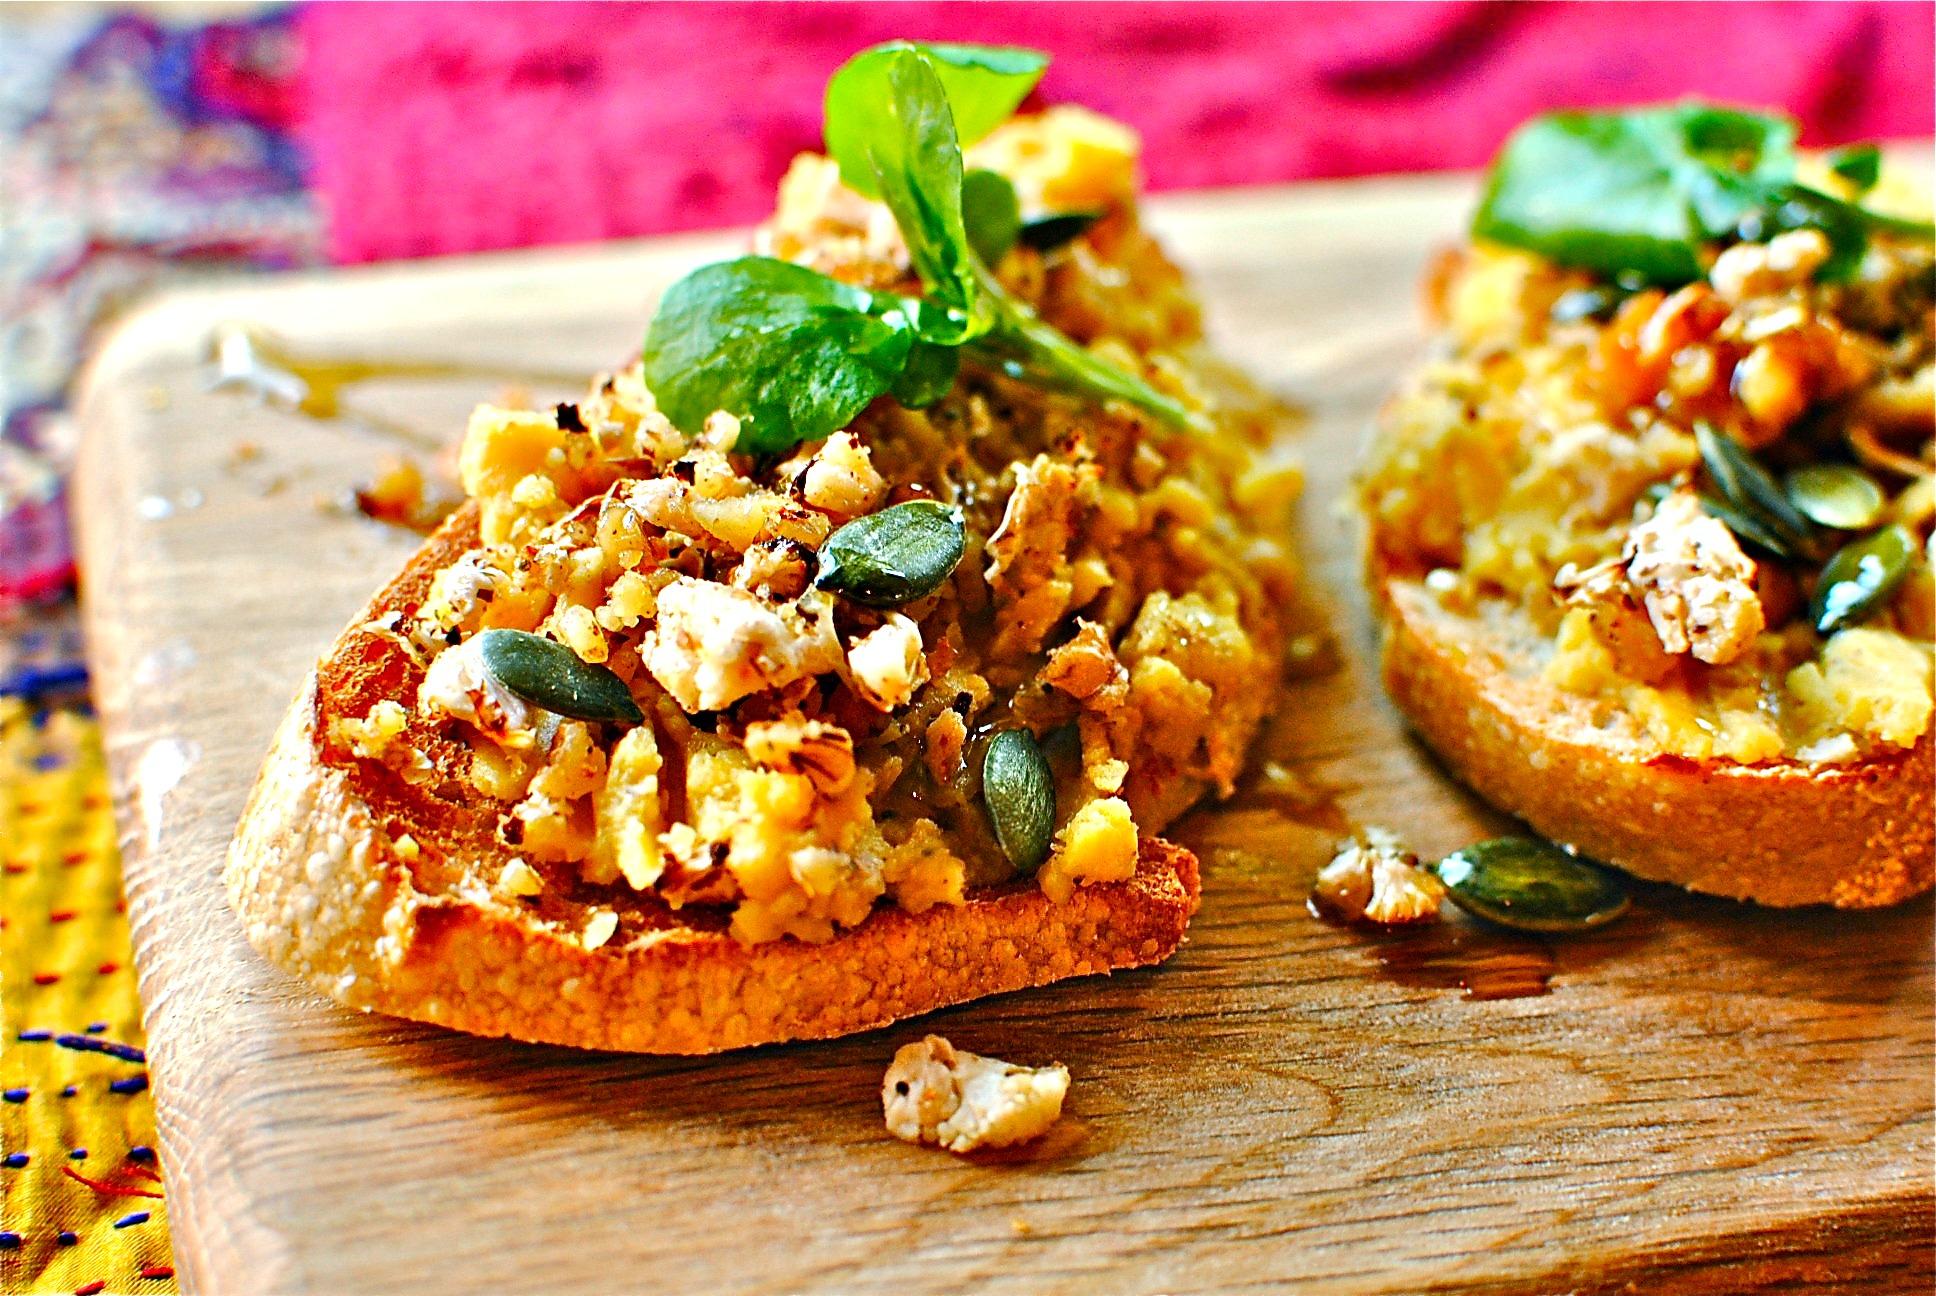 Roasted Pumpkin Hummus With Cauliflower And Walnut Crumble Gf Df Food To Glow